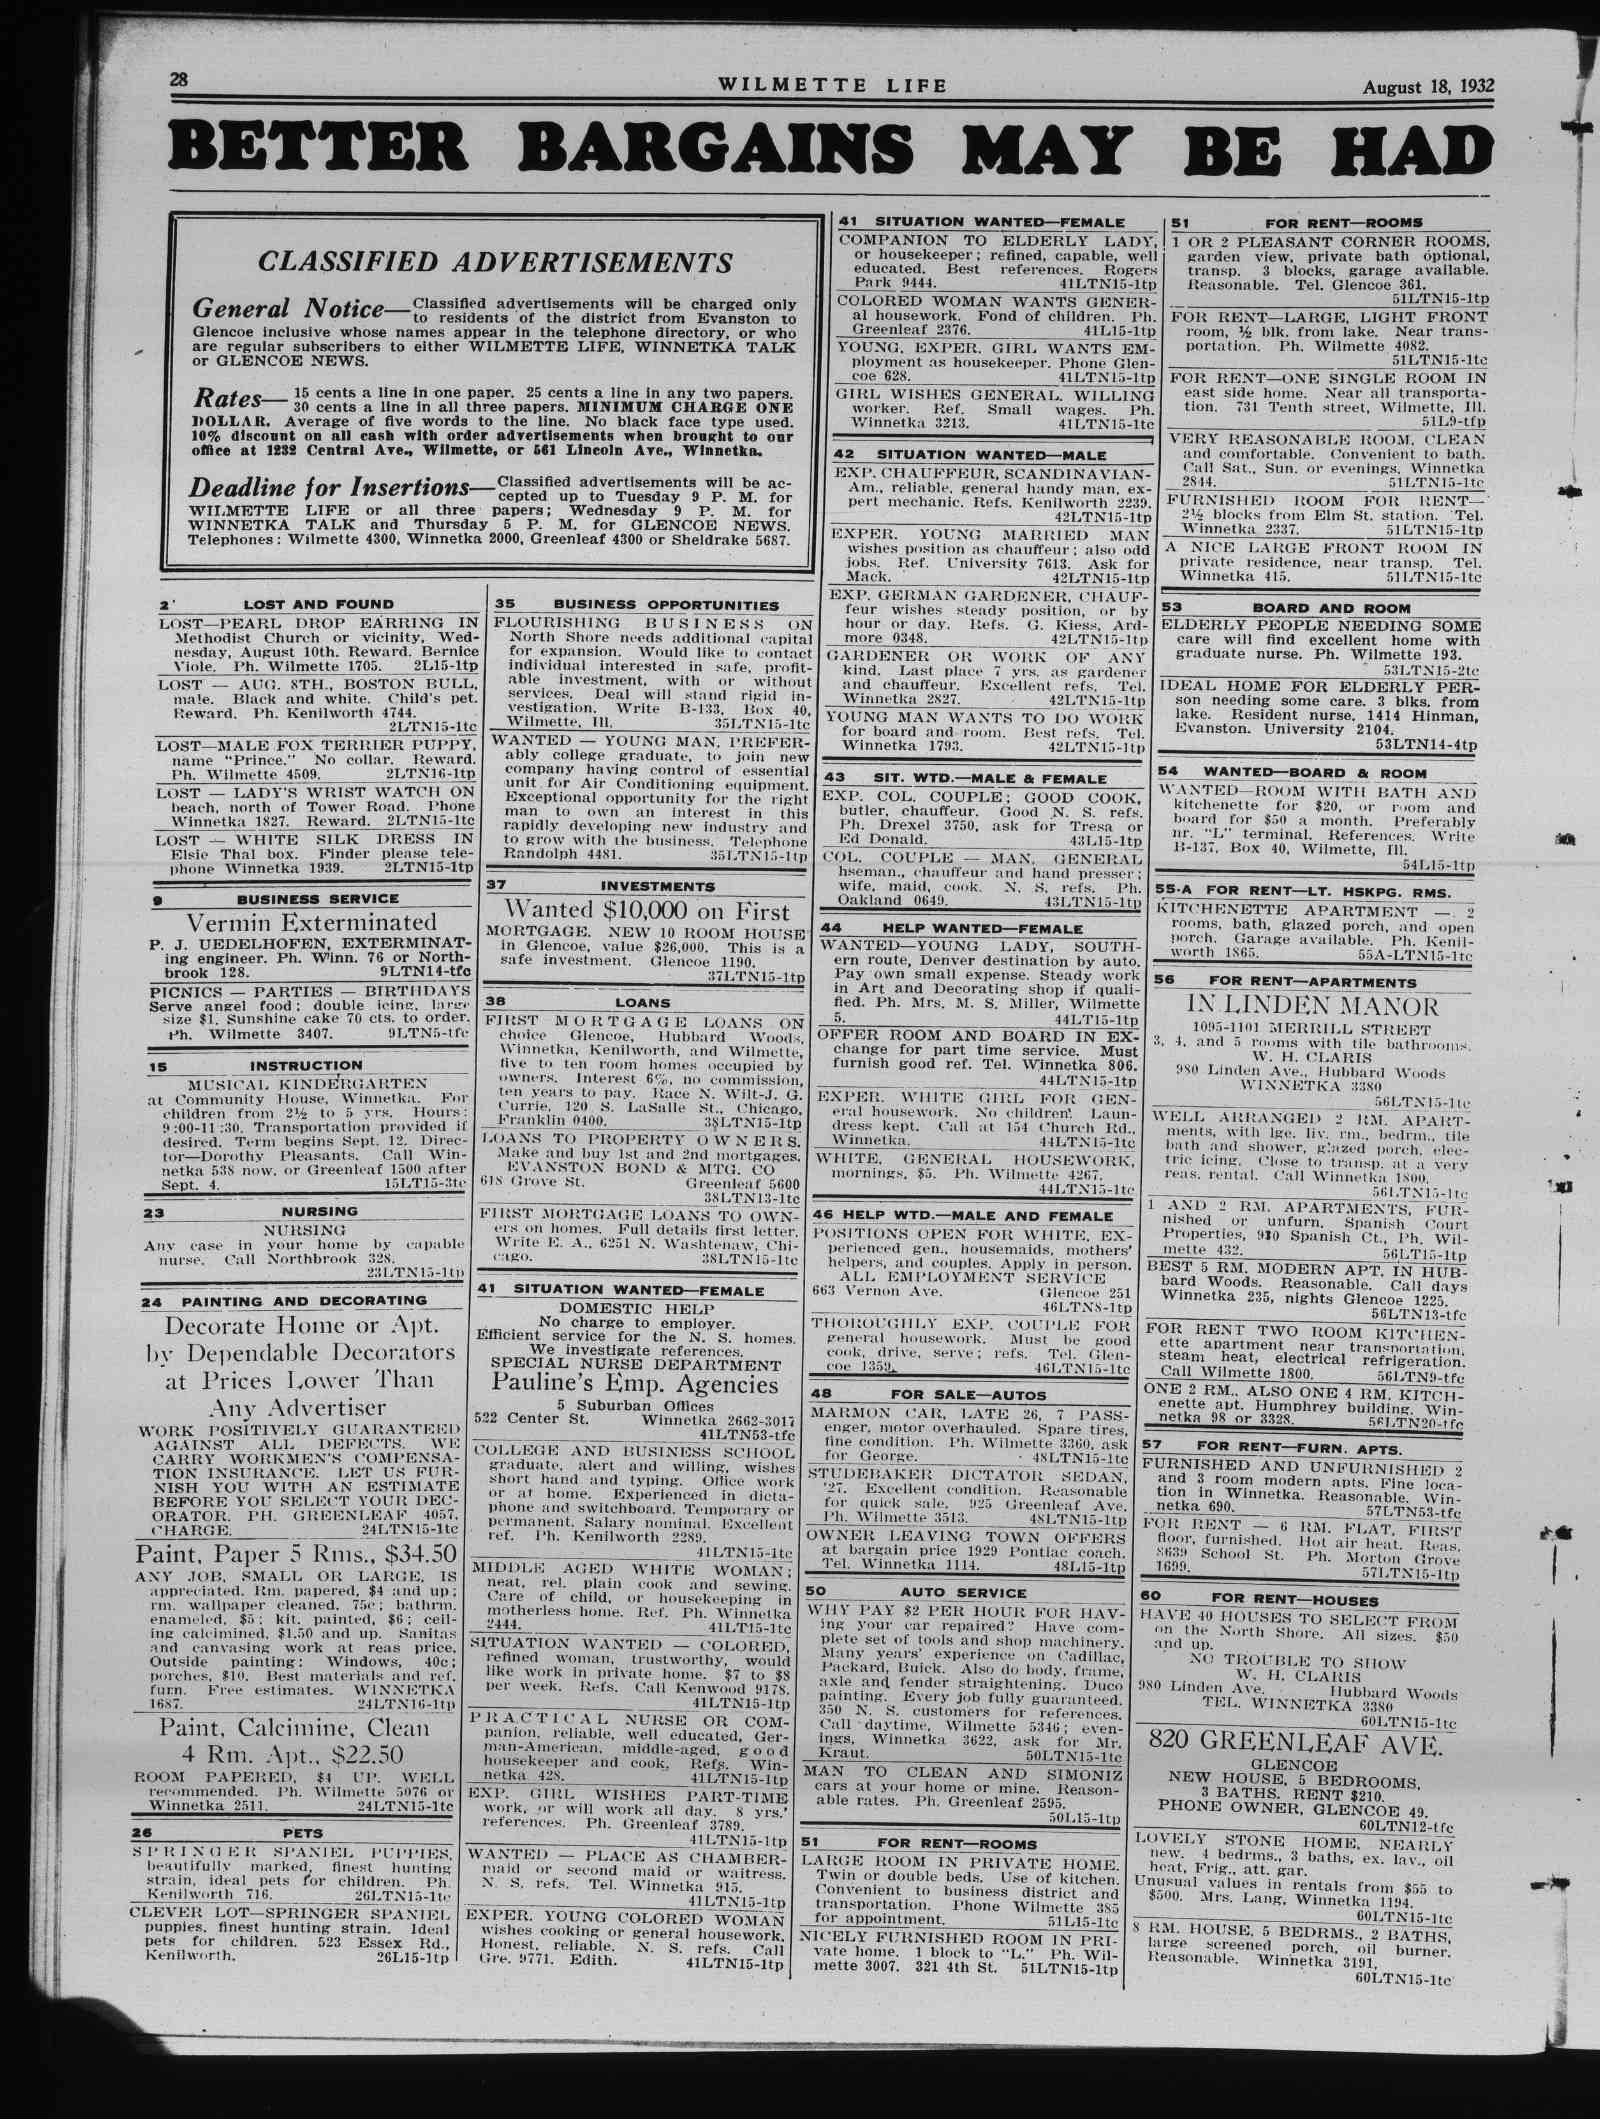 Wilmette Life (Wilmette, Illinois), 18 Aug 1932